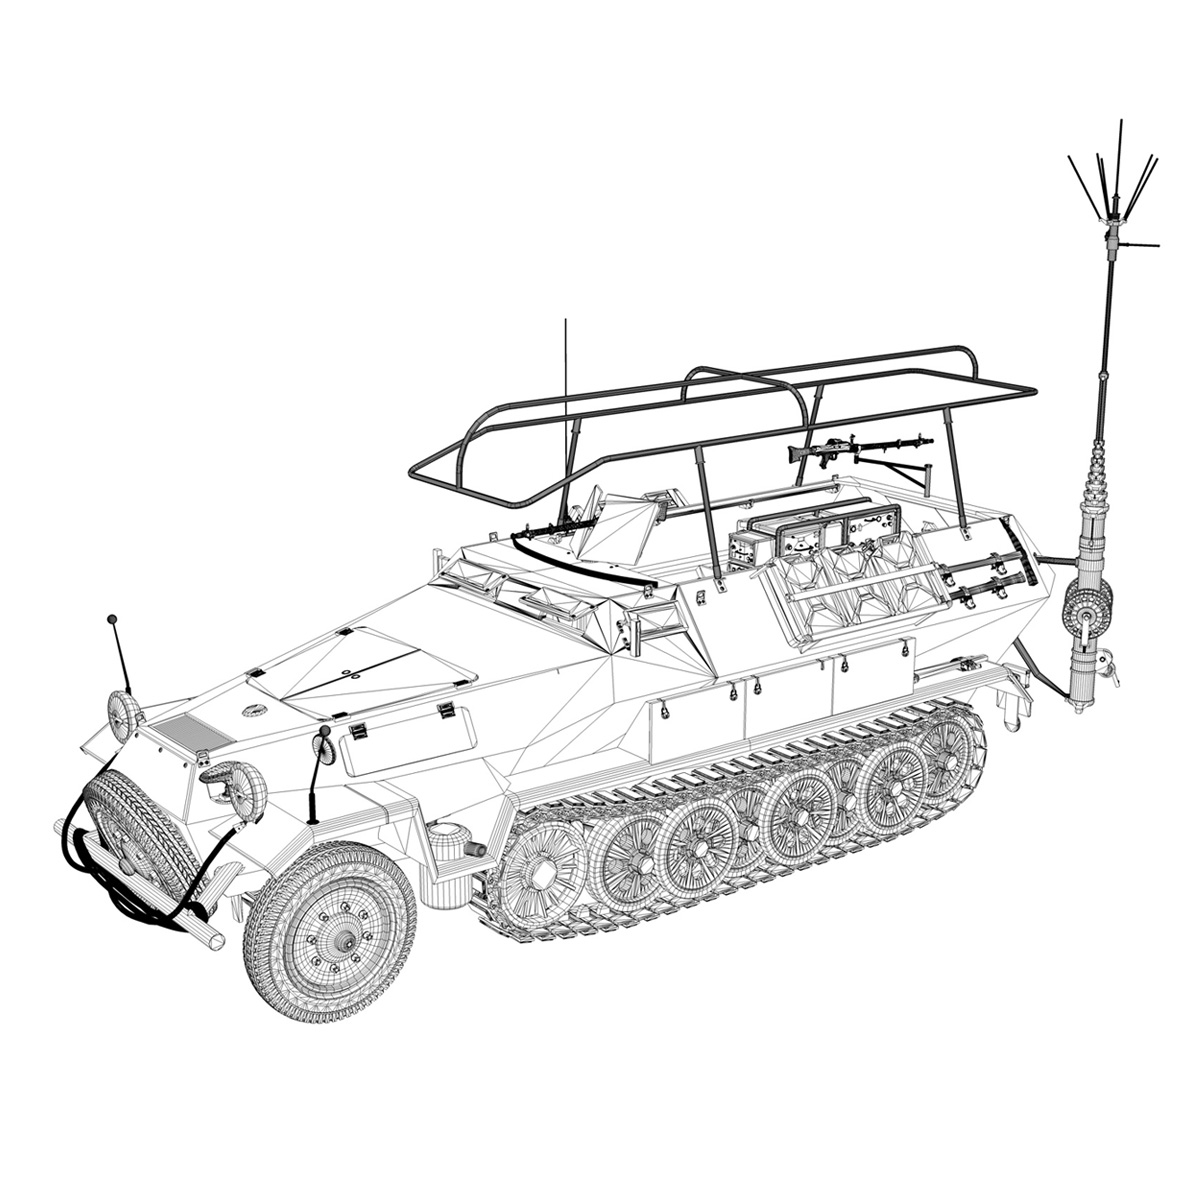 sdkfz 251 ausf.b – communications vehicle 3d model 3ds fbx c4d lwo obj 251700